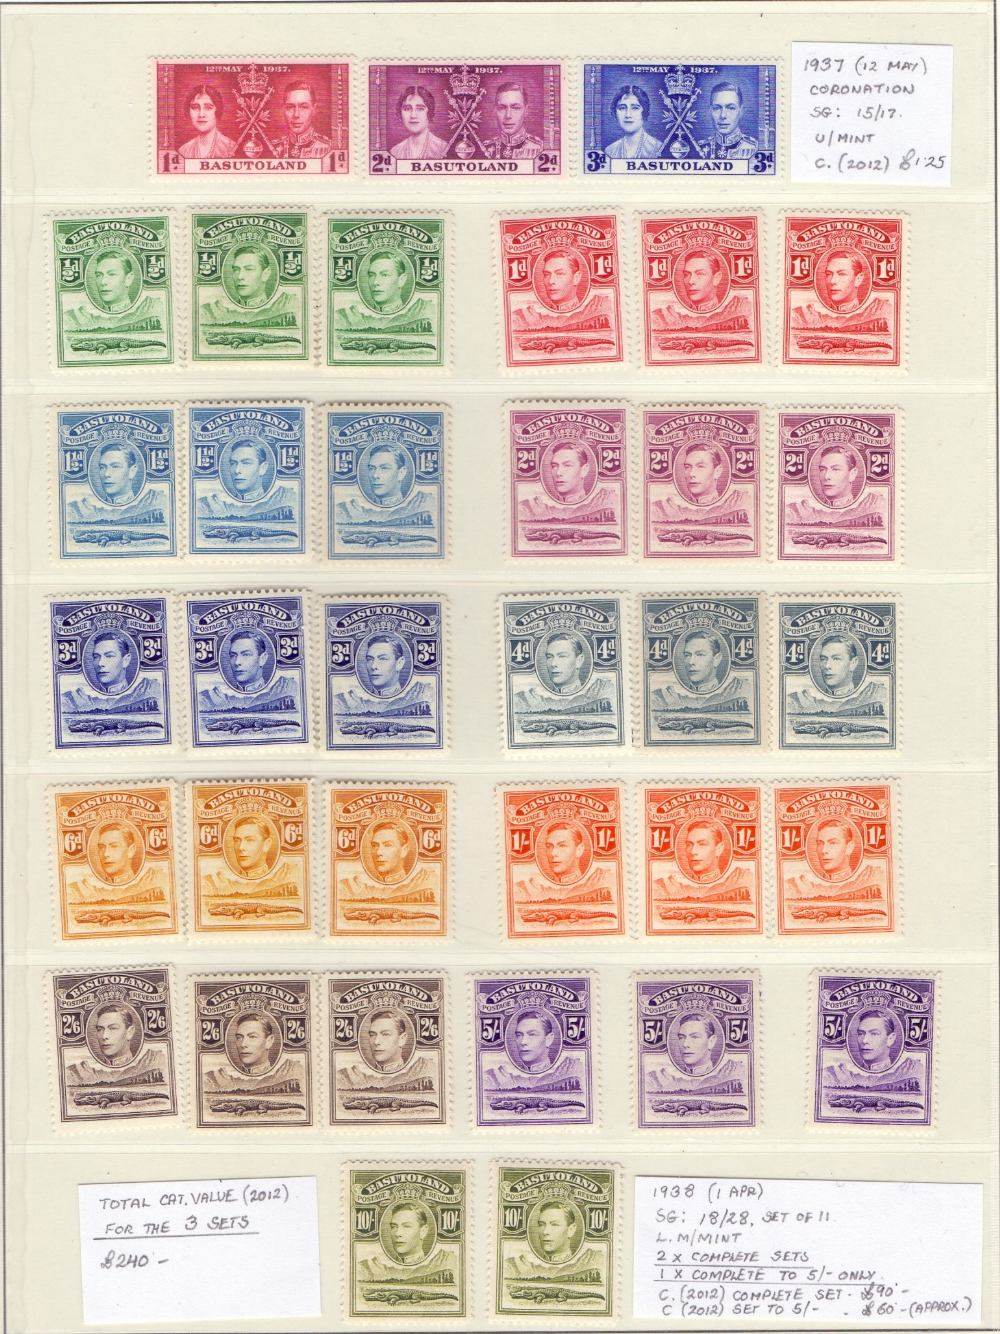 Lot 2 - STAMPS : BRITISH AFRICA, mint collection in album inc Basutoland GV 1933 set & GVI 1938 set (2),